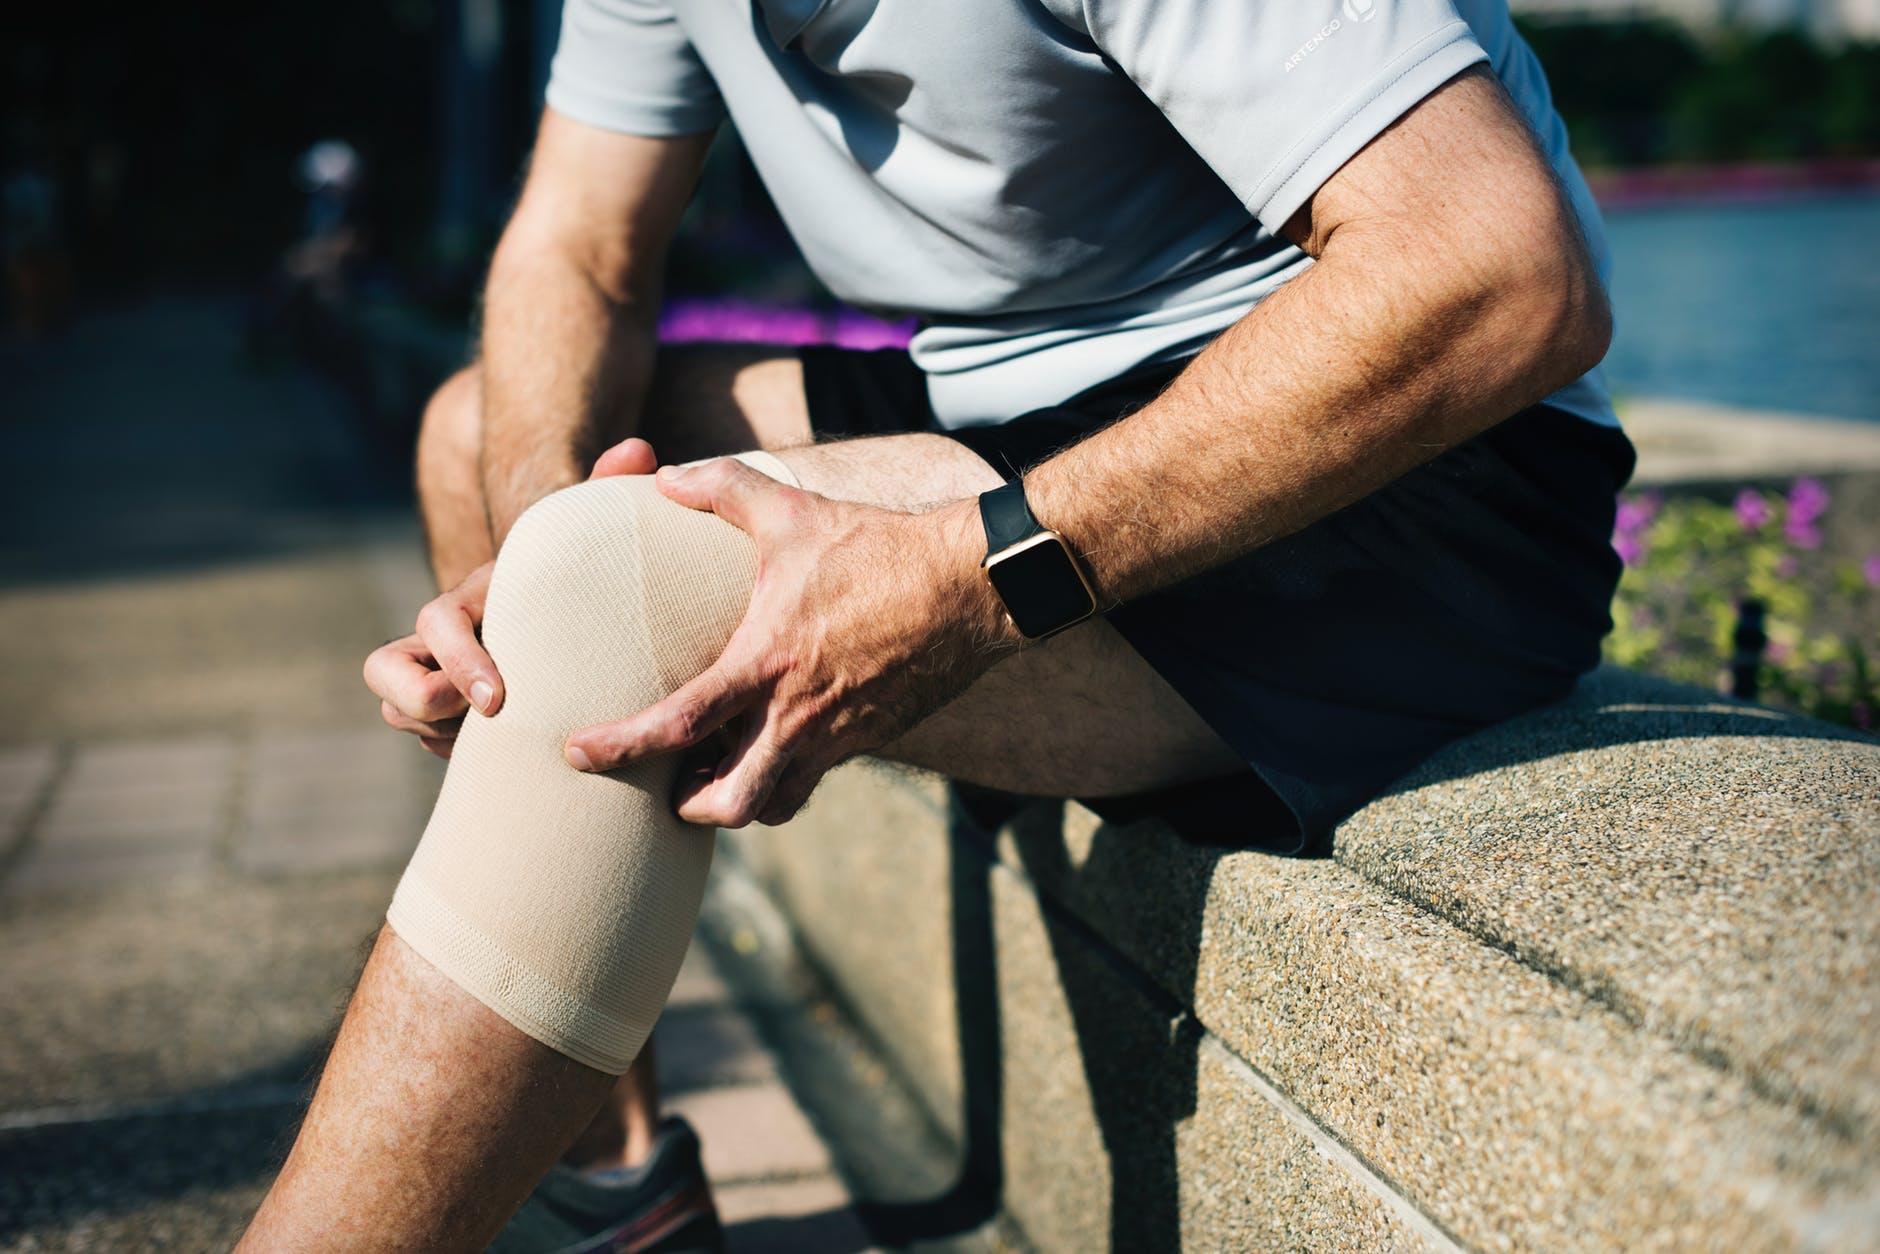 best exercise equipment for bad knees